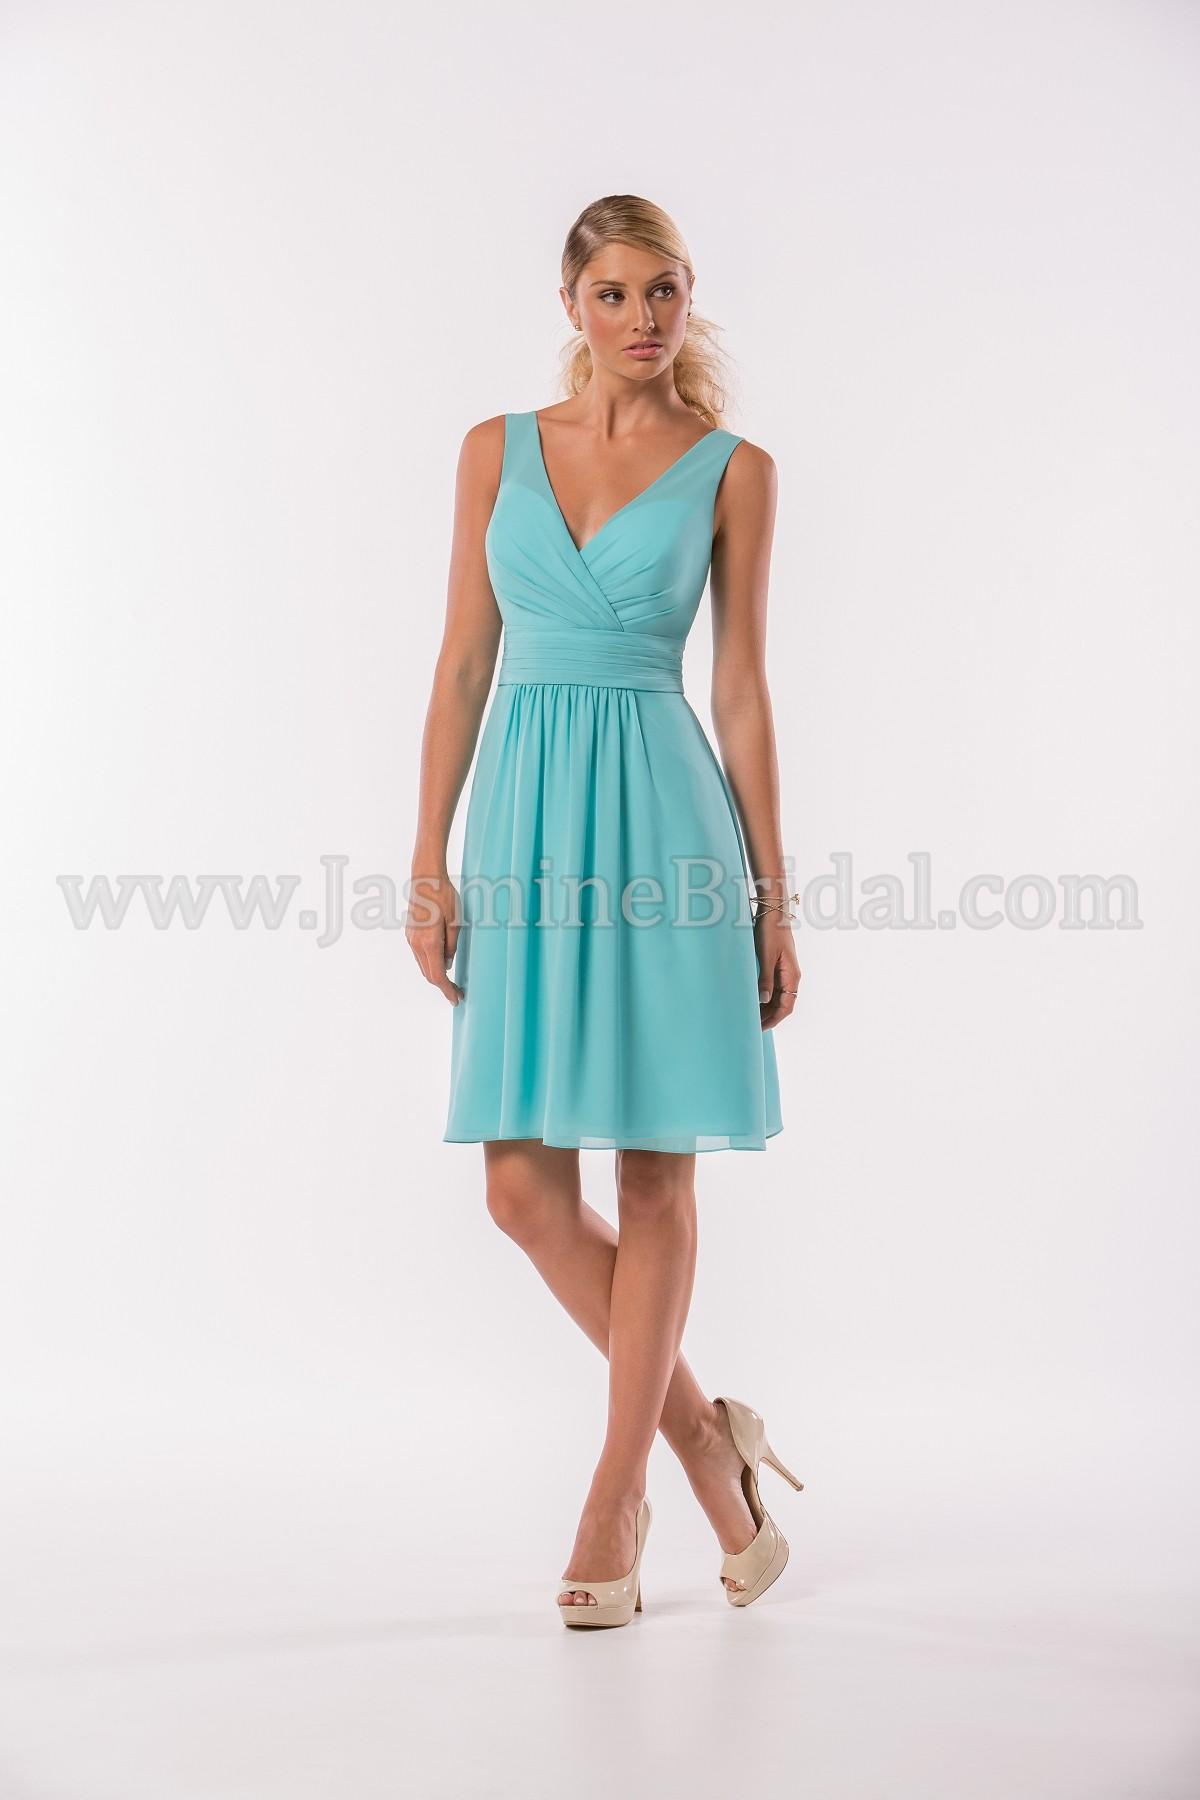 P186014K Knee Length V-neck Georgette Bridesmaid Dress